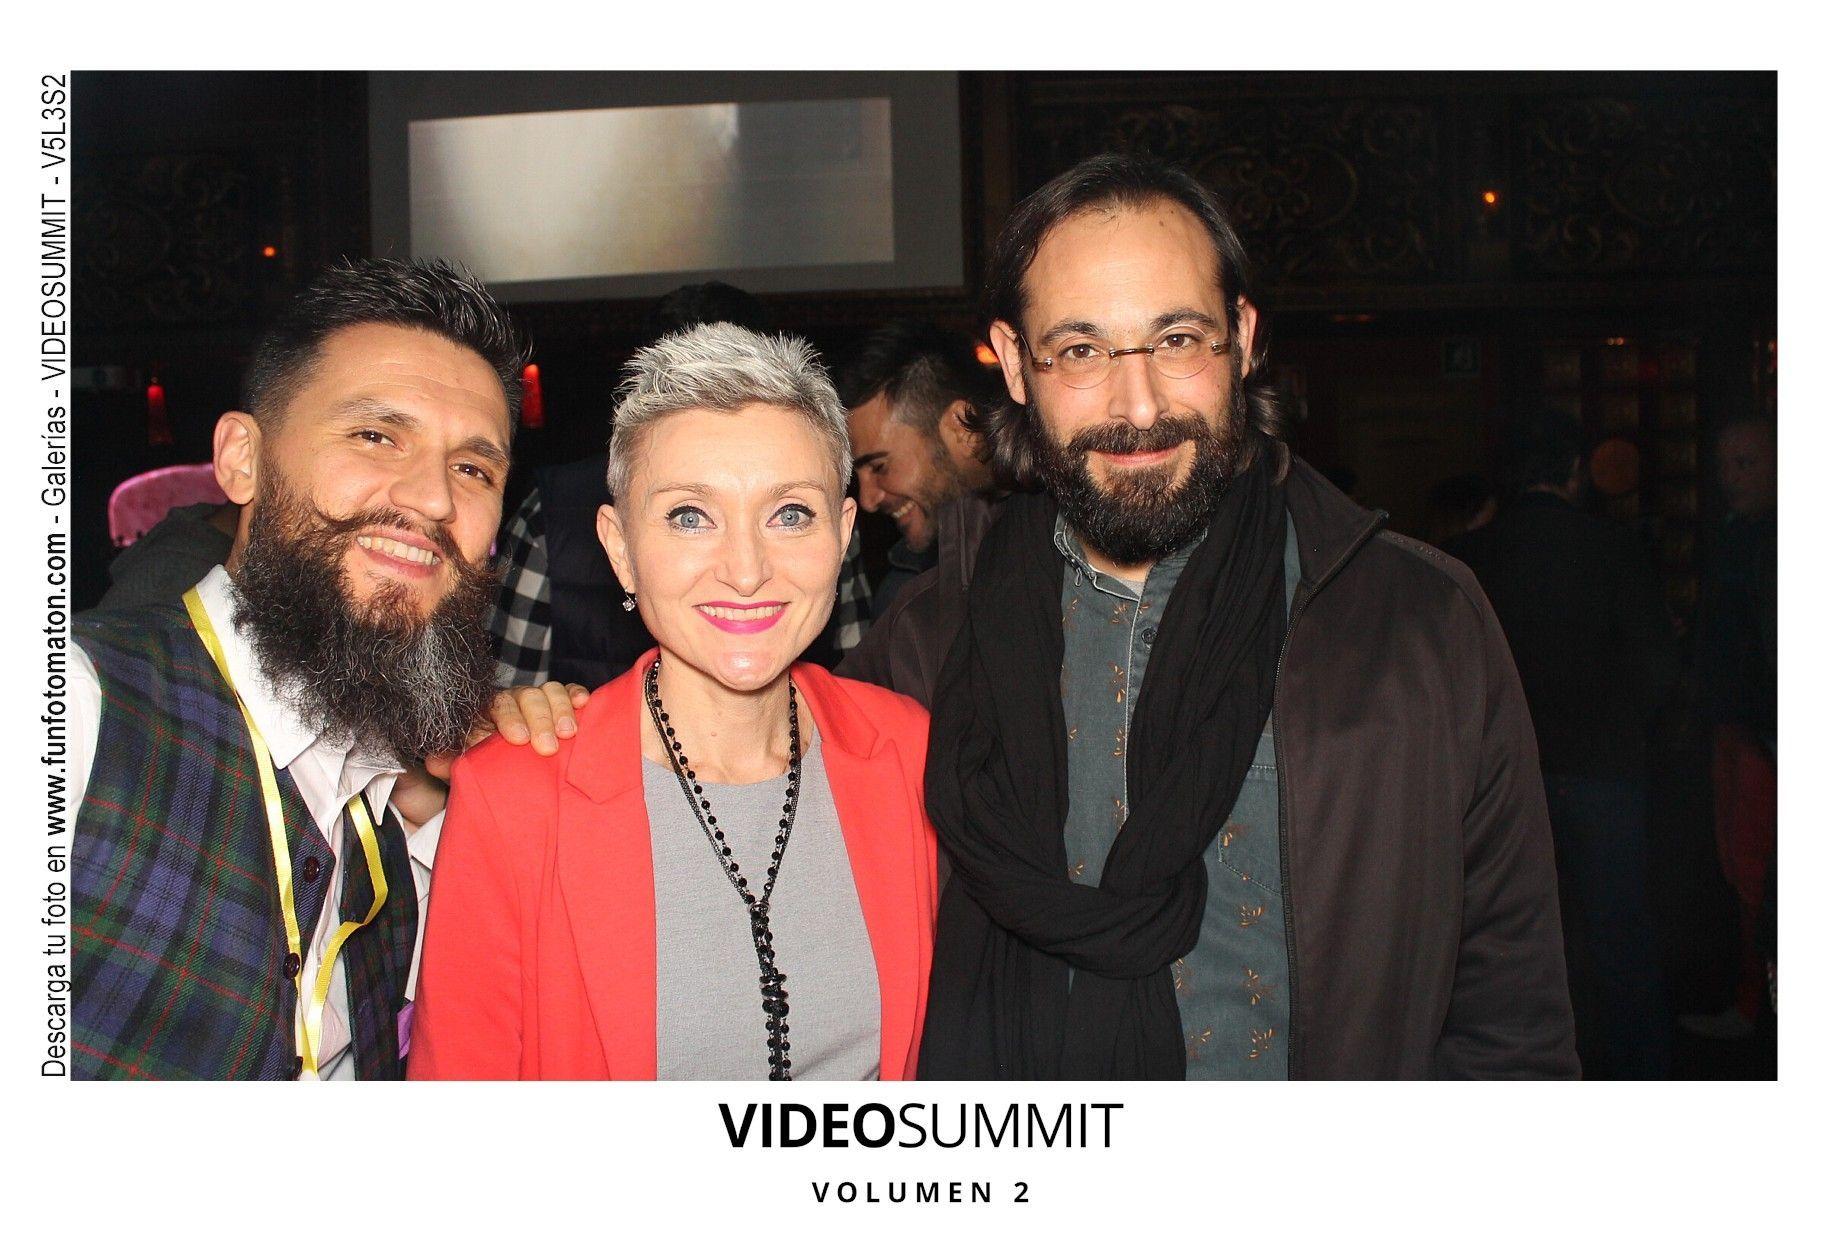 videosummit-vol2-club-party-001